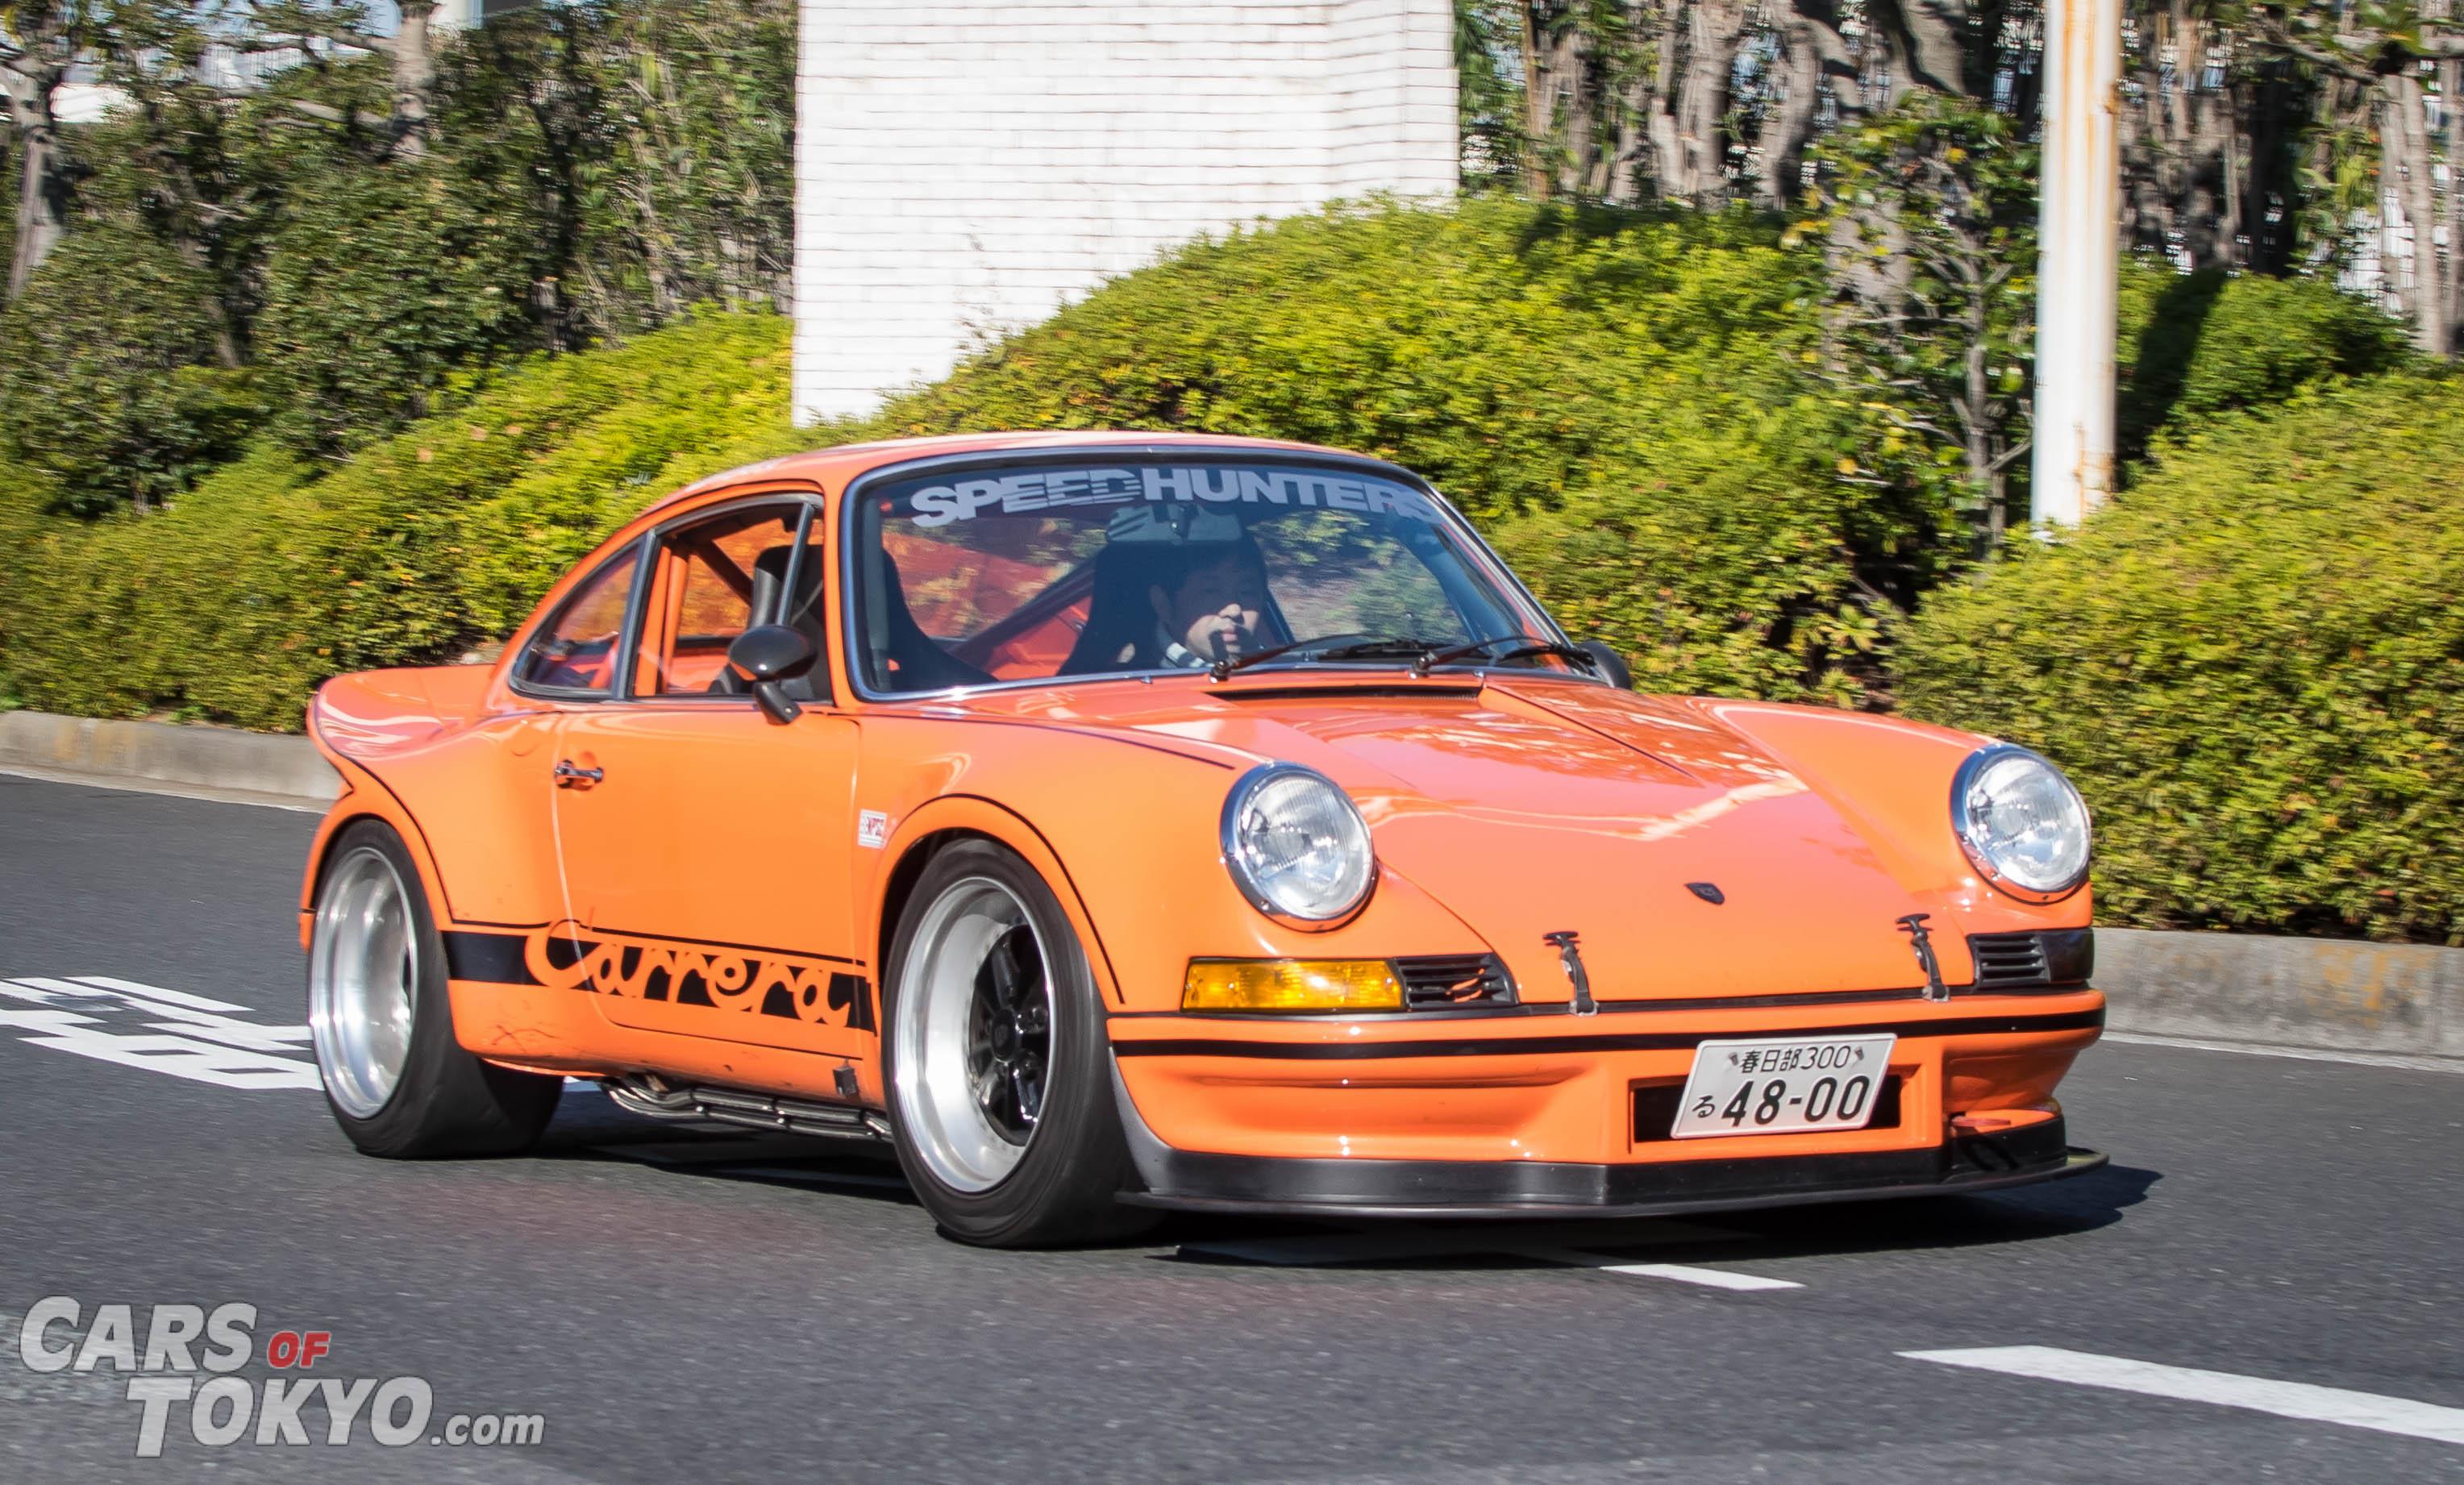 Cars of Tokyo Classic Porsche 911 Carrera RSR